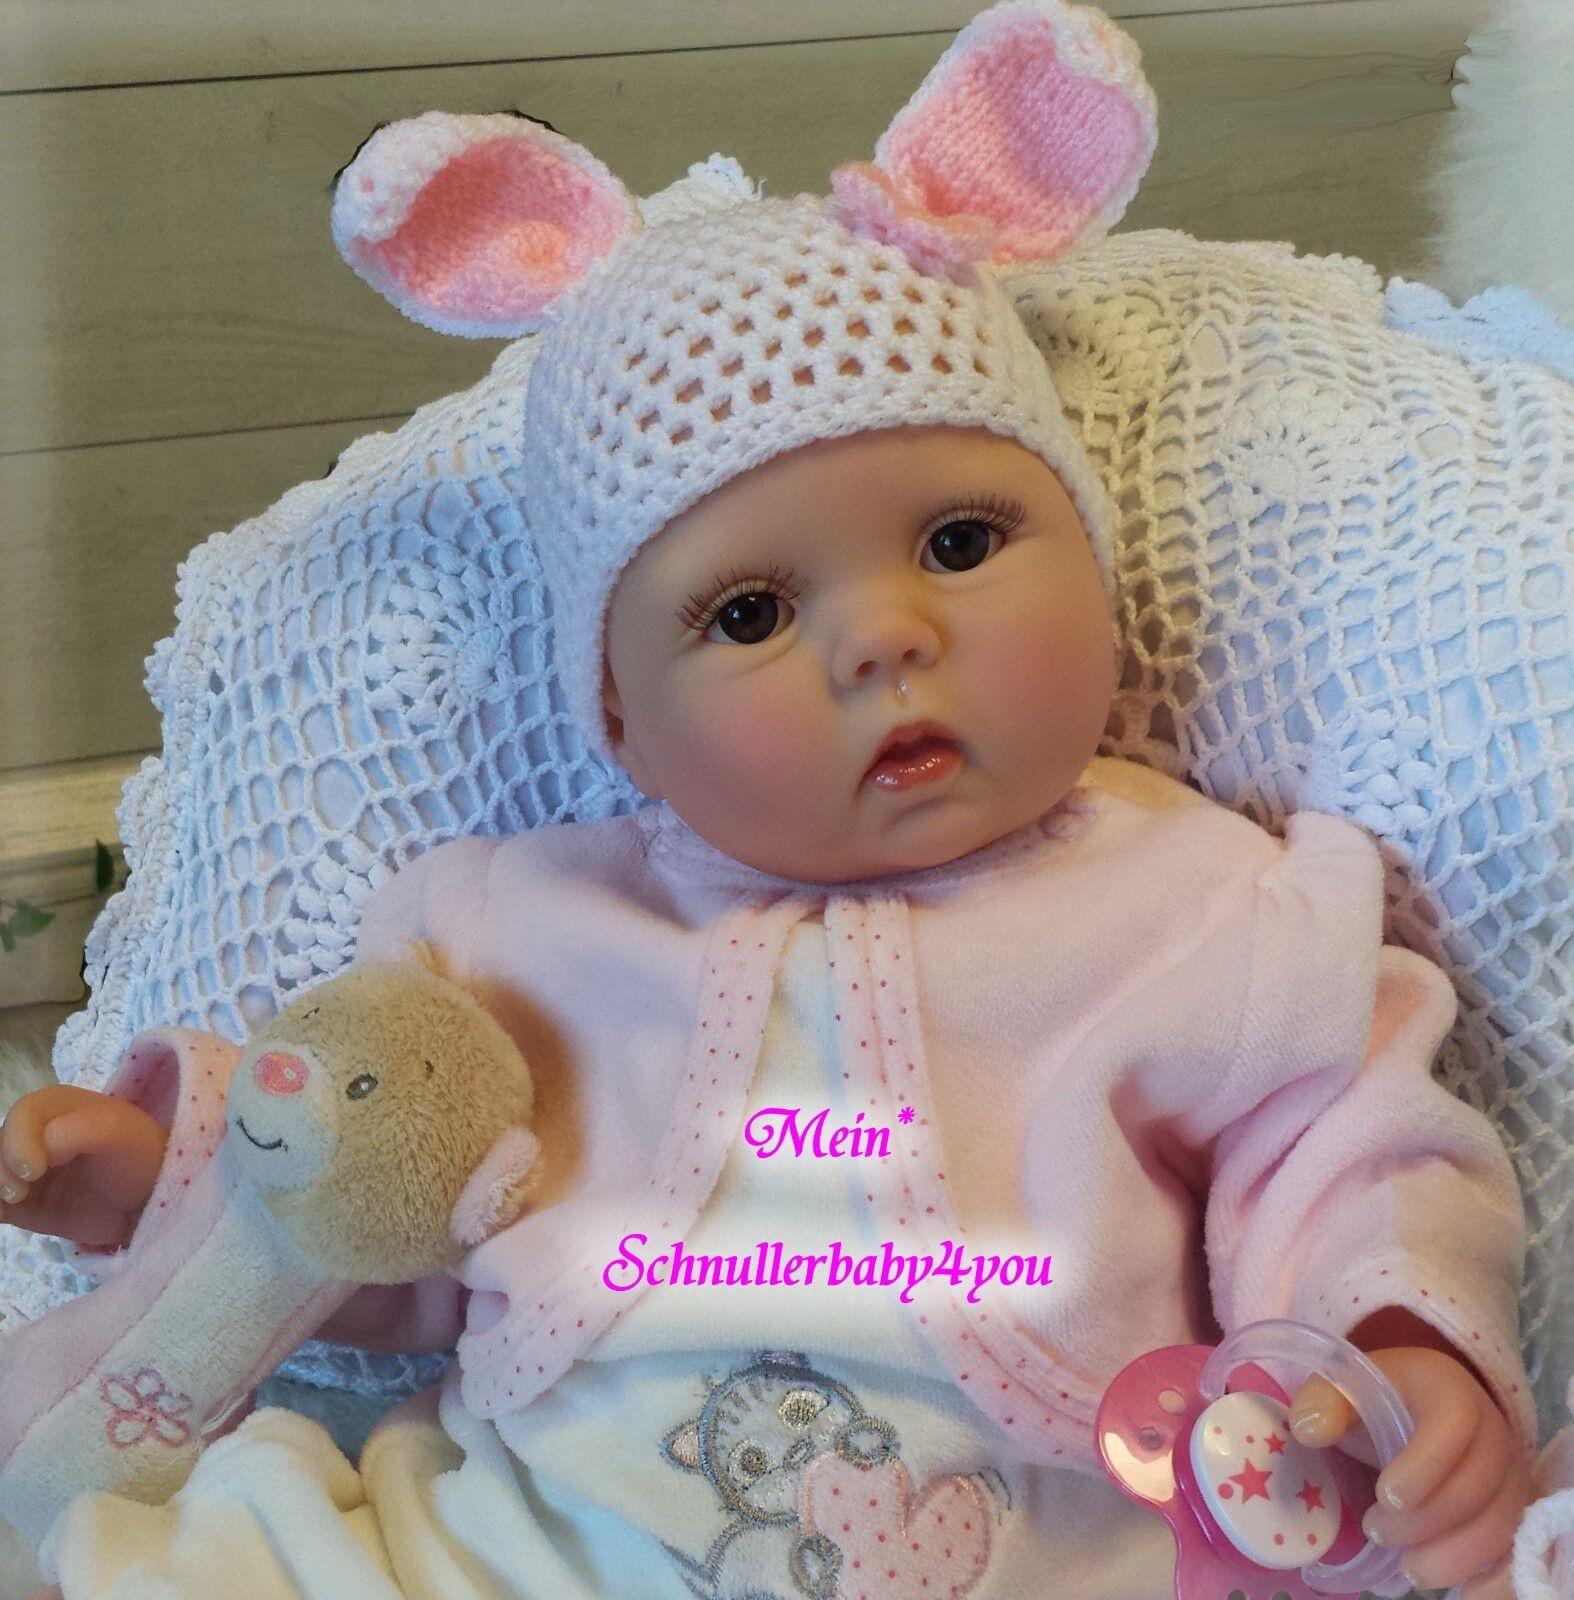 ✨ Reborn Reallife Baby BS U.L Krautter Baby Oster Hase Geschenk Babypuppe✨